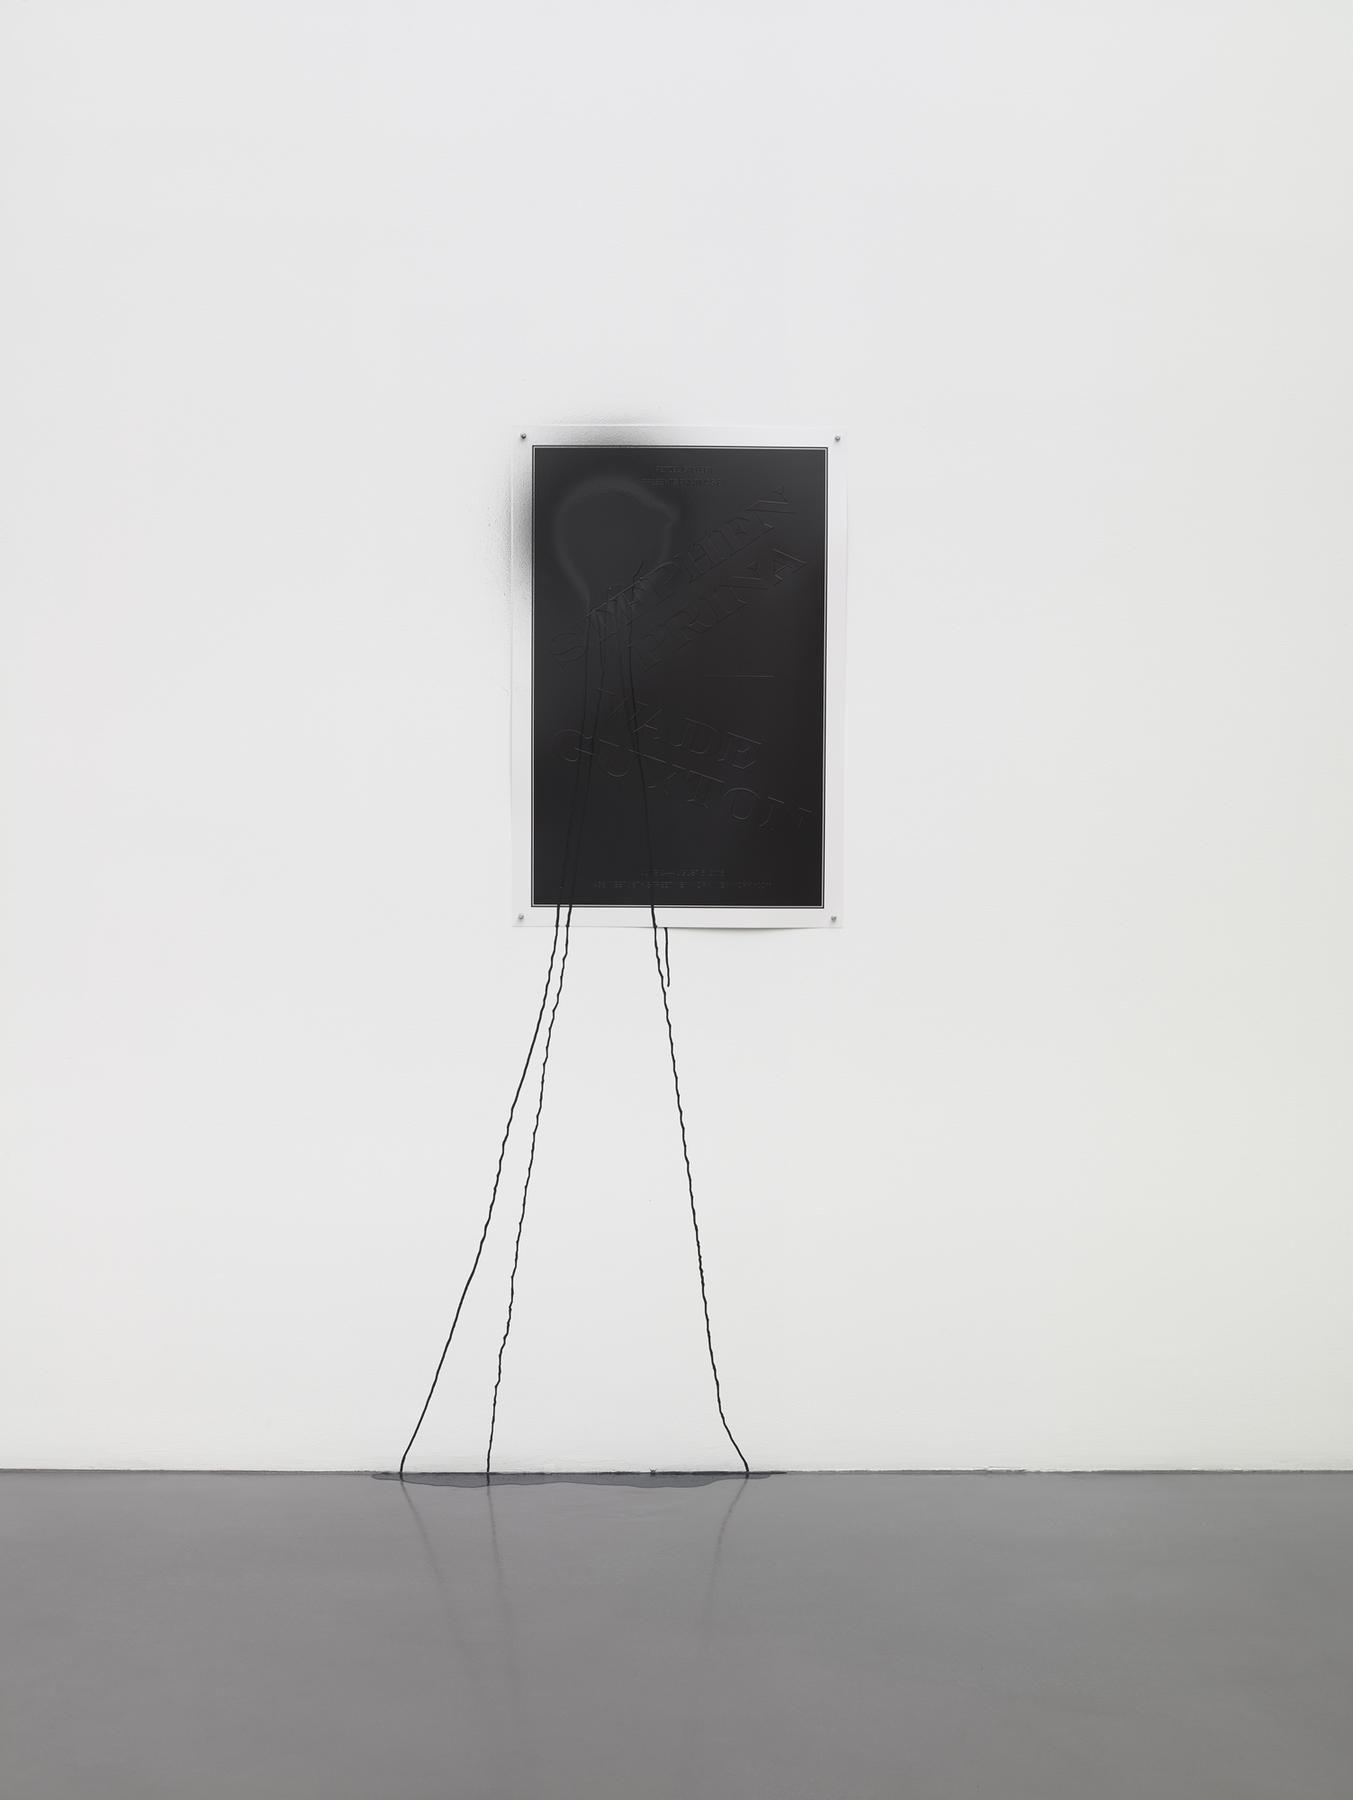 Stephen Prina/Joseph Logan